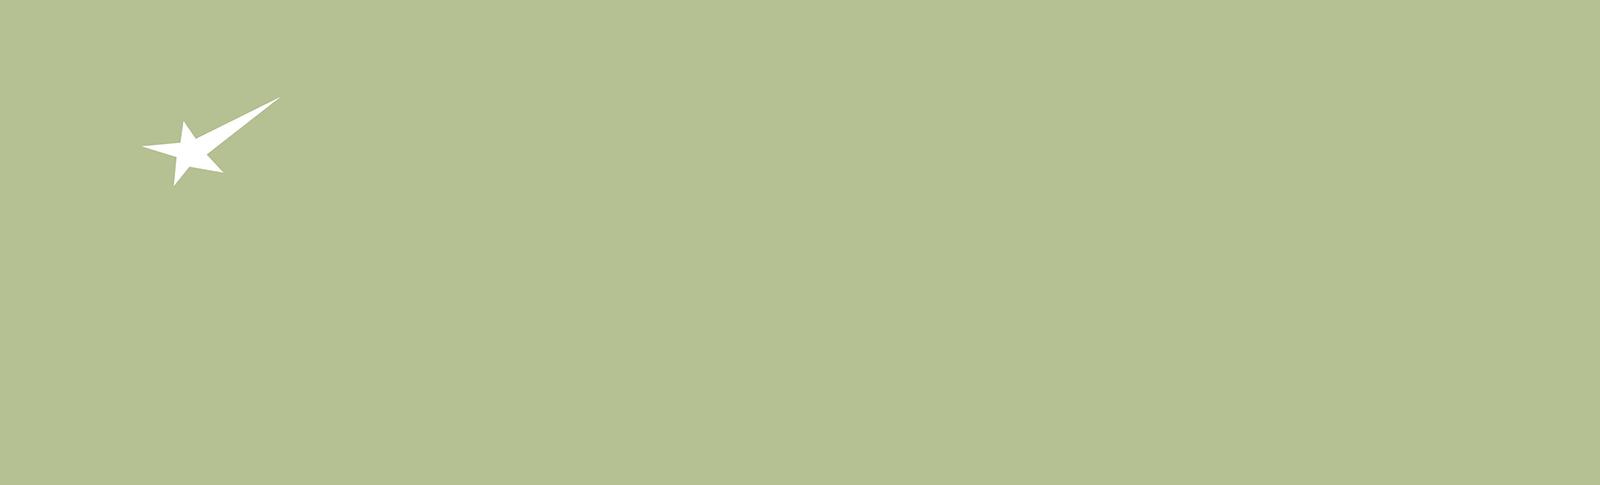 Logo Blitz & Blank